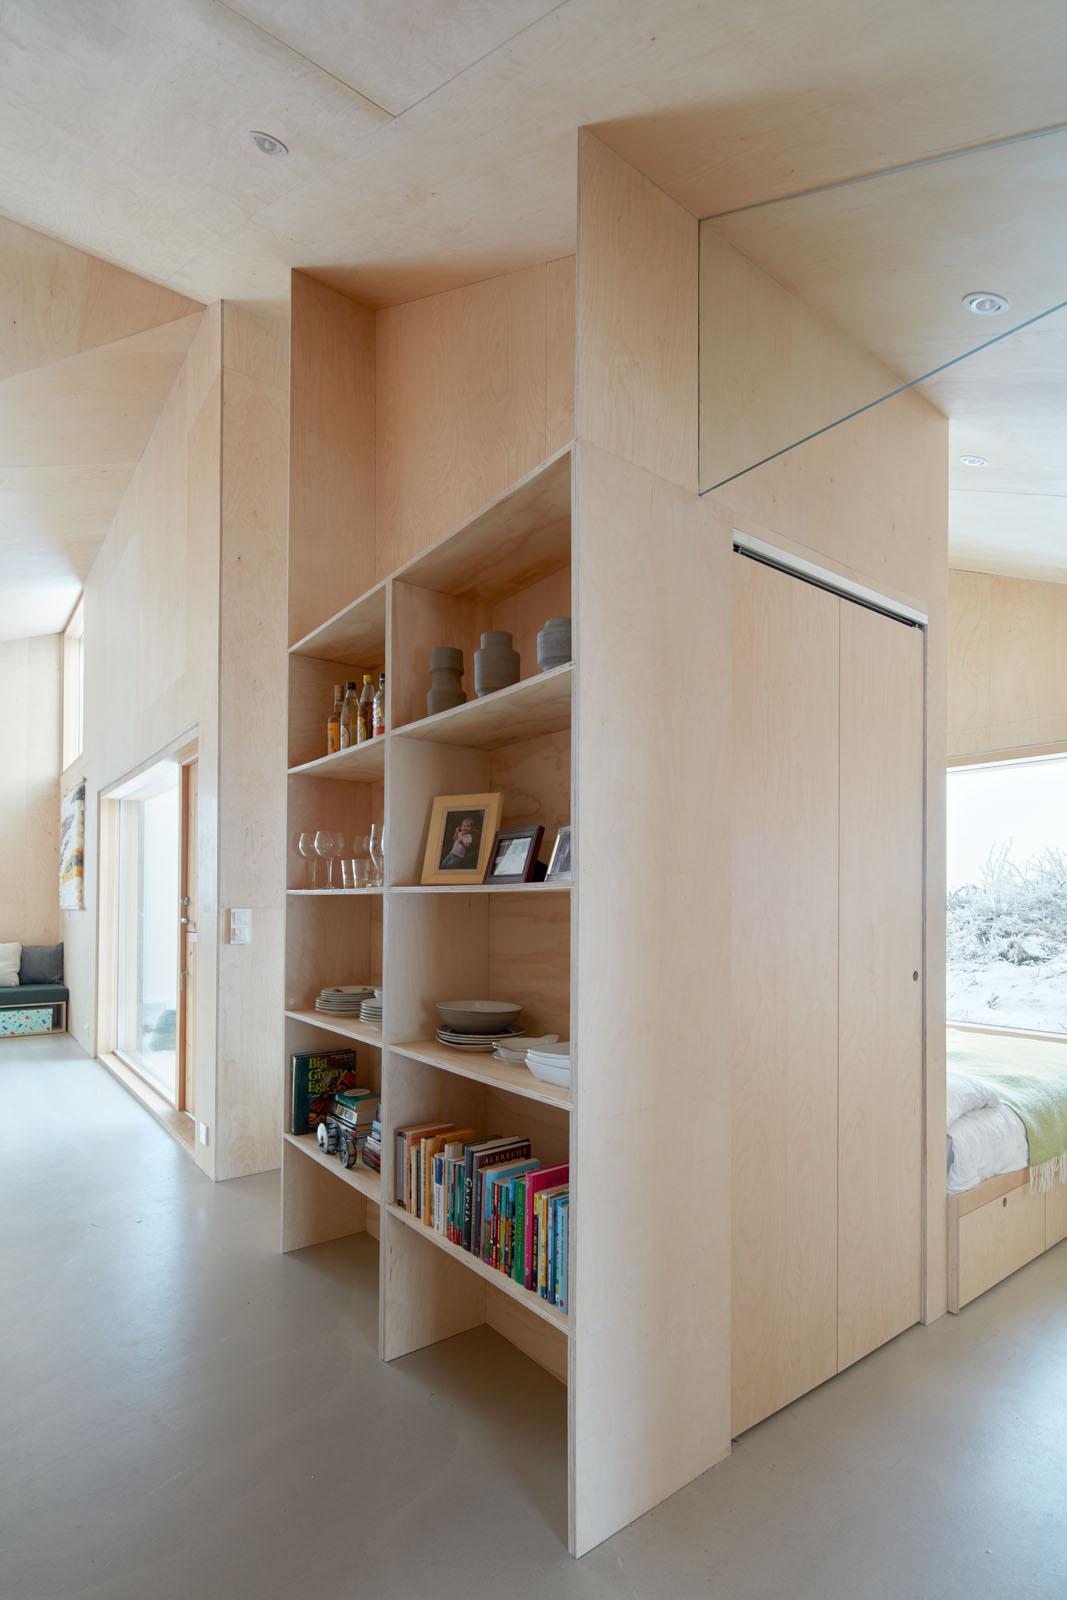 <p>Mylla hytte, Jevnaker county door Mork-Ulnes Architects</p>